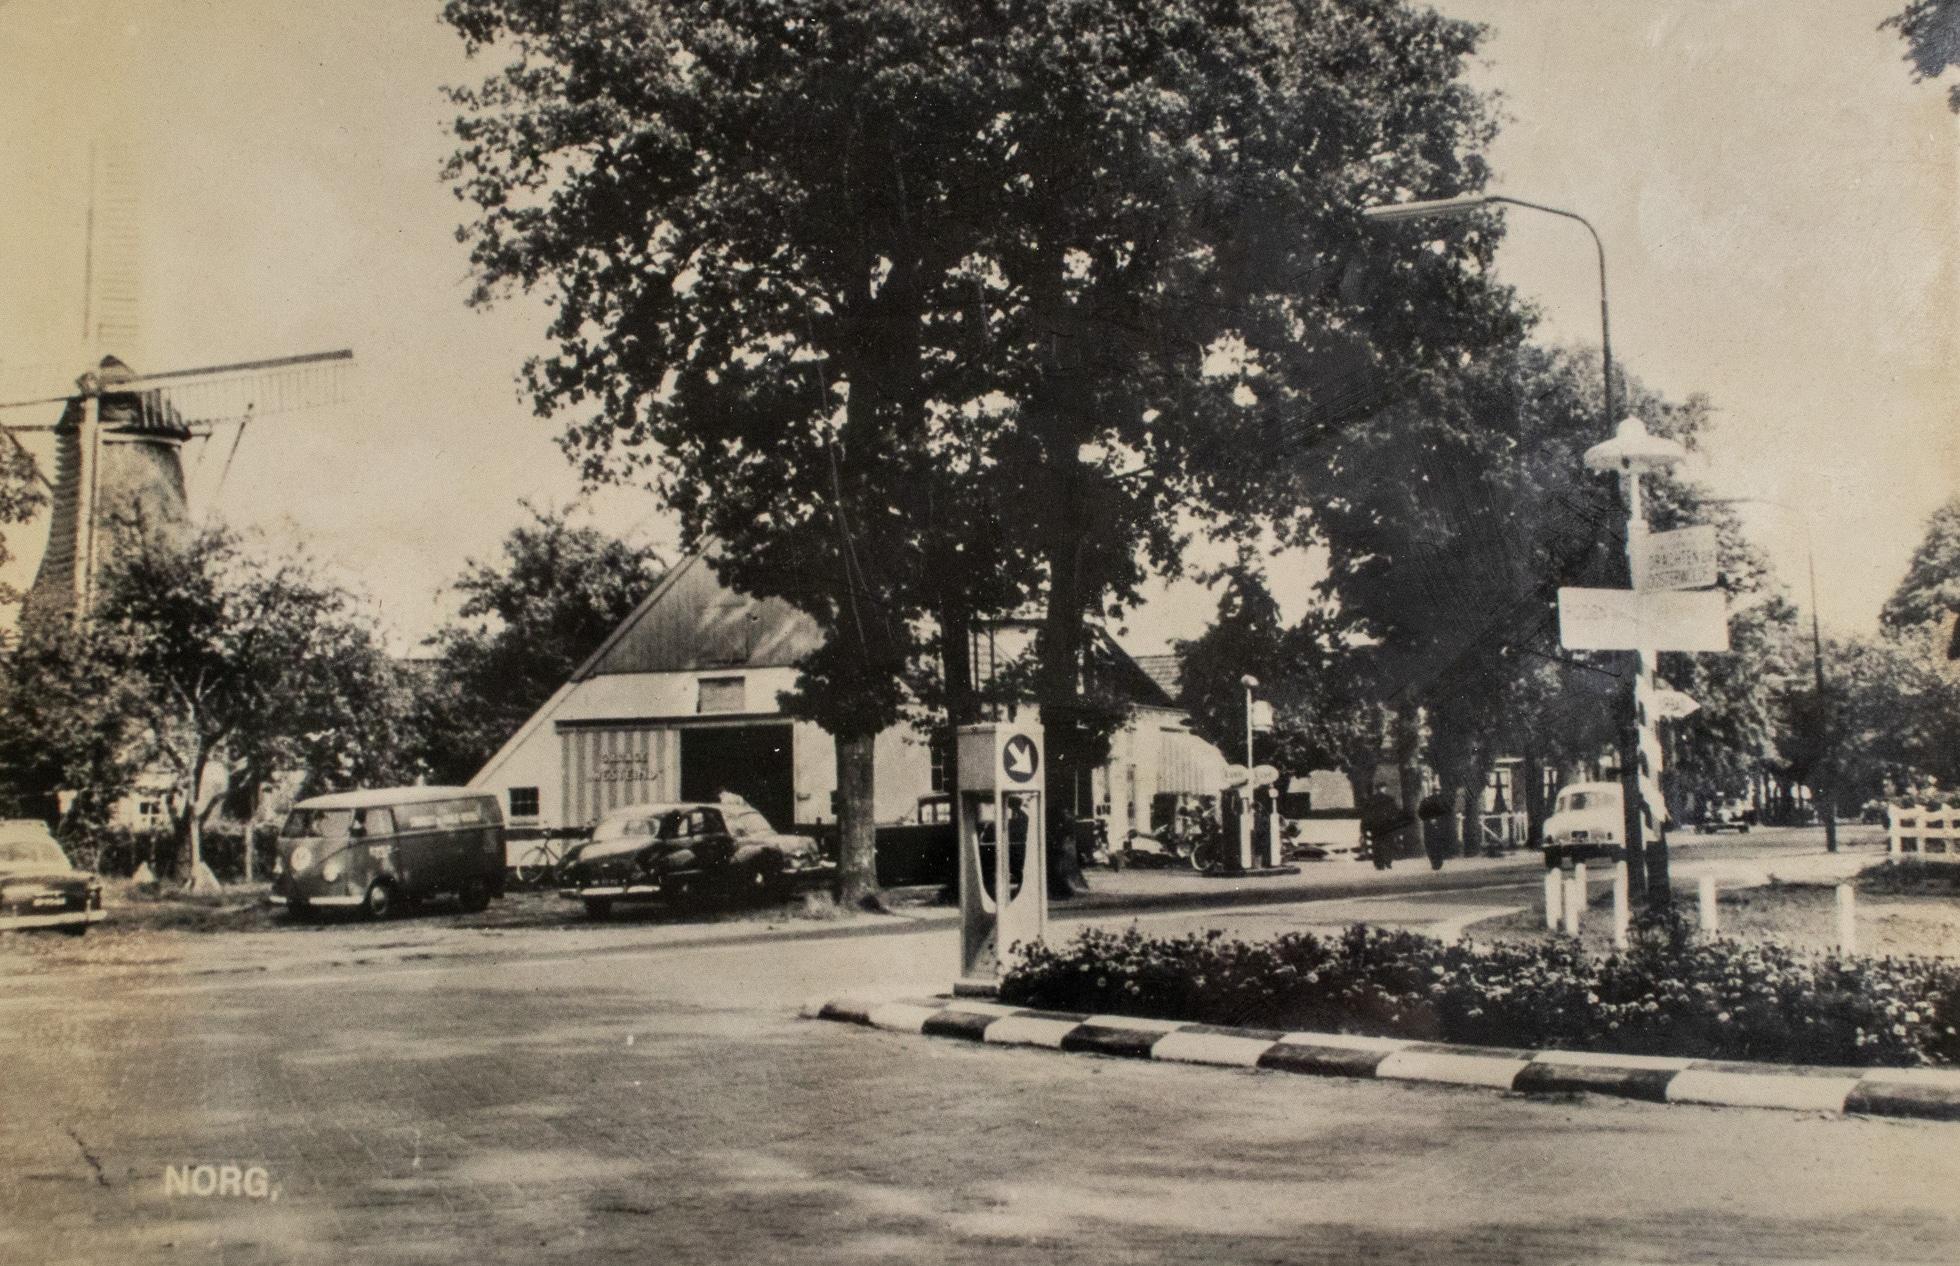 Garage-Dorenbos-Norg-Drenthe-historie-6827